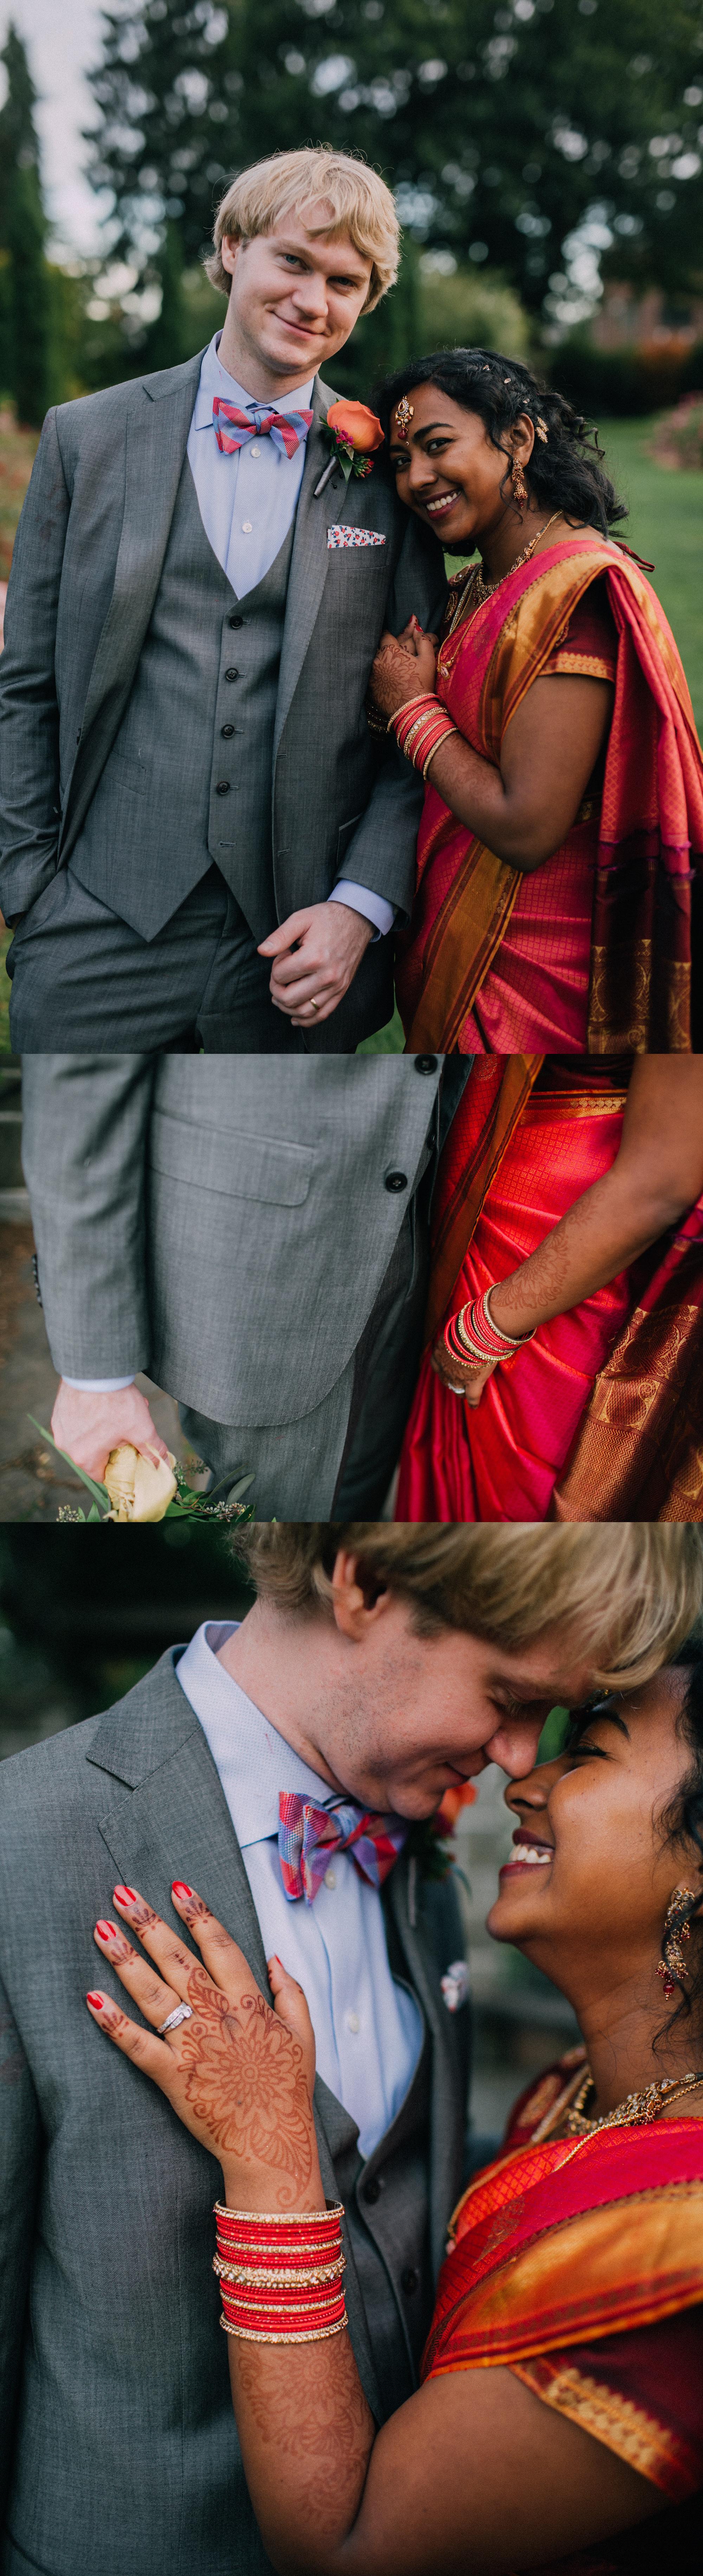 seattle wedding photographer and courthouse elopement photography washington -10.jpg